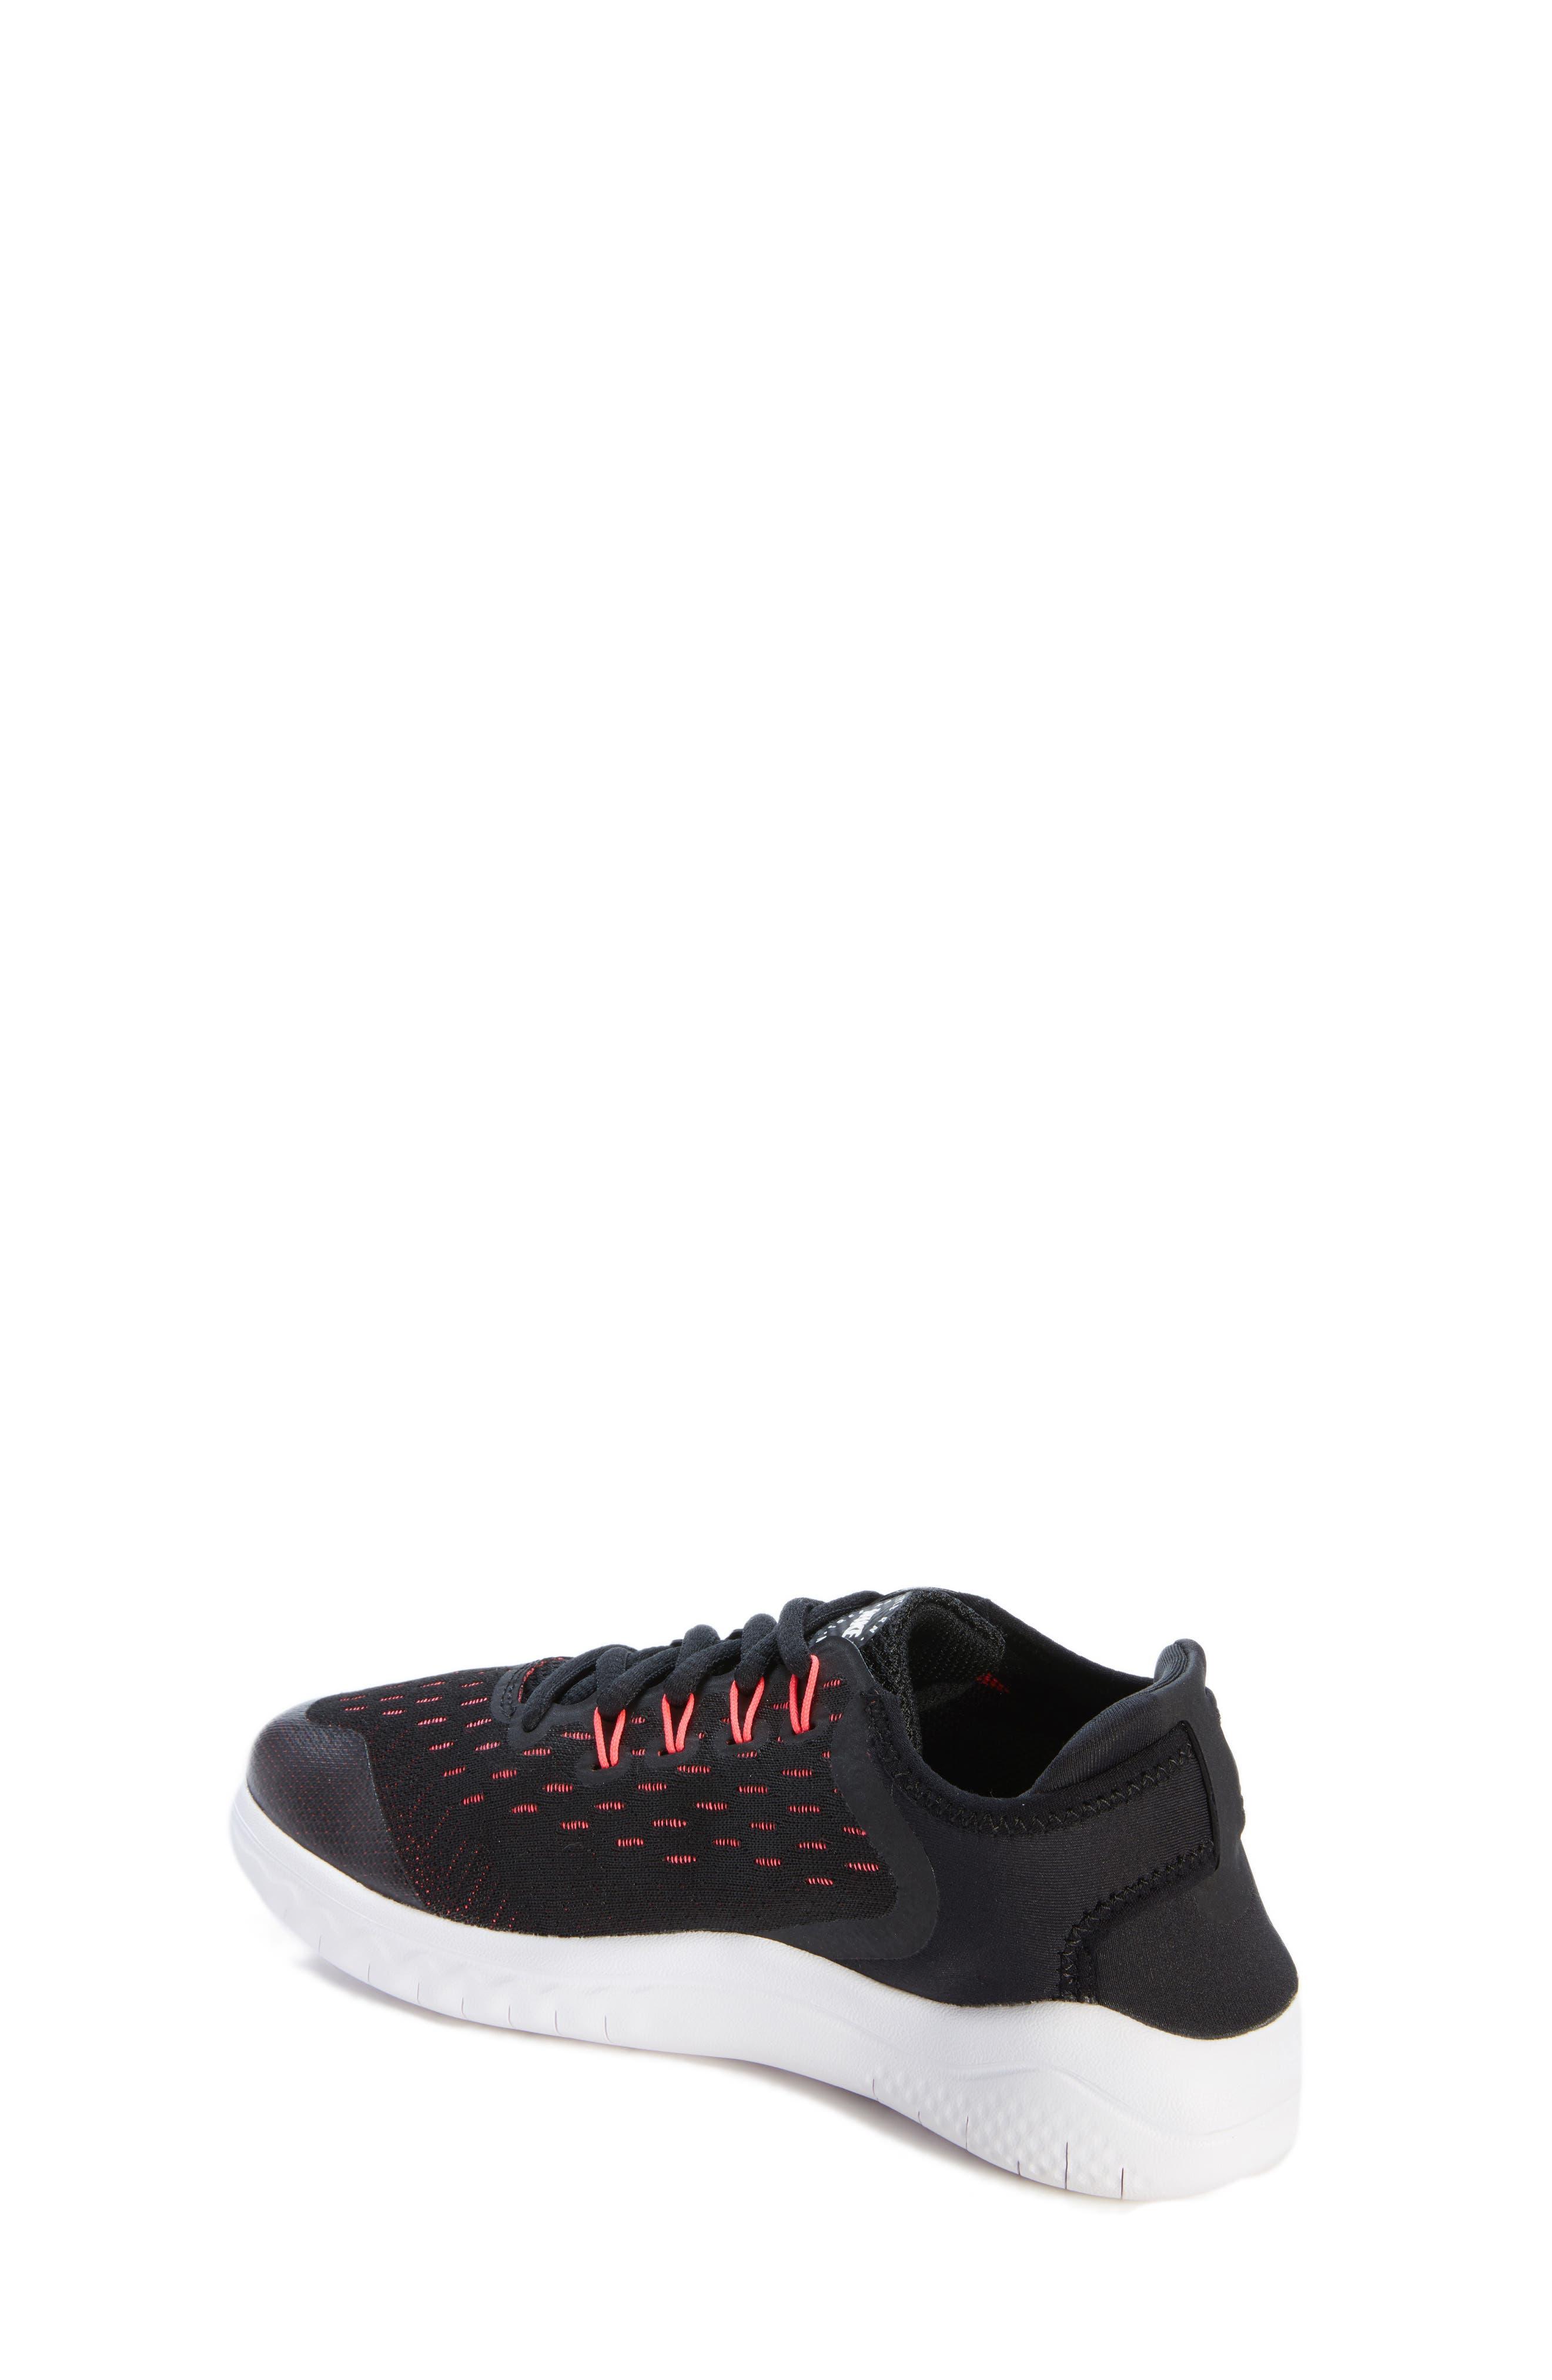 Free RN 2018 Running Shoe,                             Alternate thumbnail 2, color,                             Black/ White/ Pink/ Volt